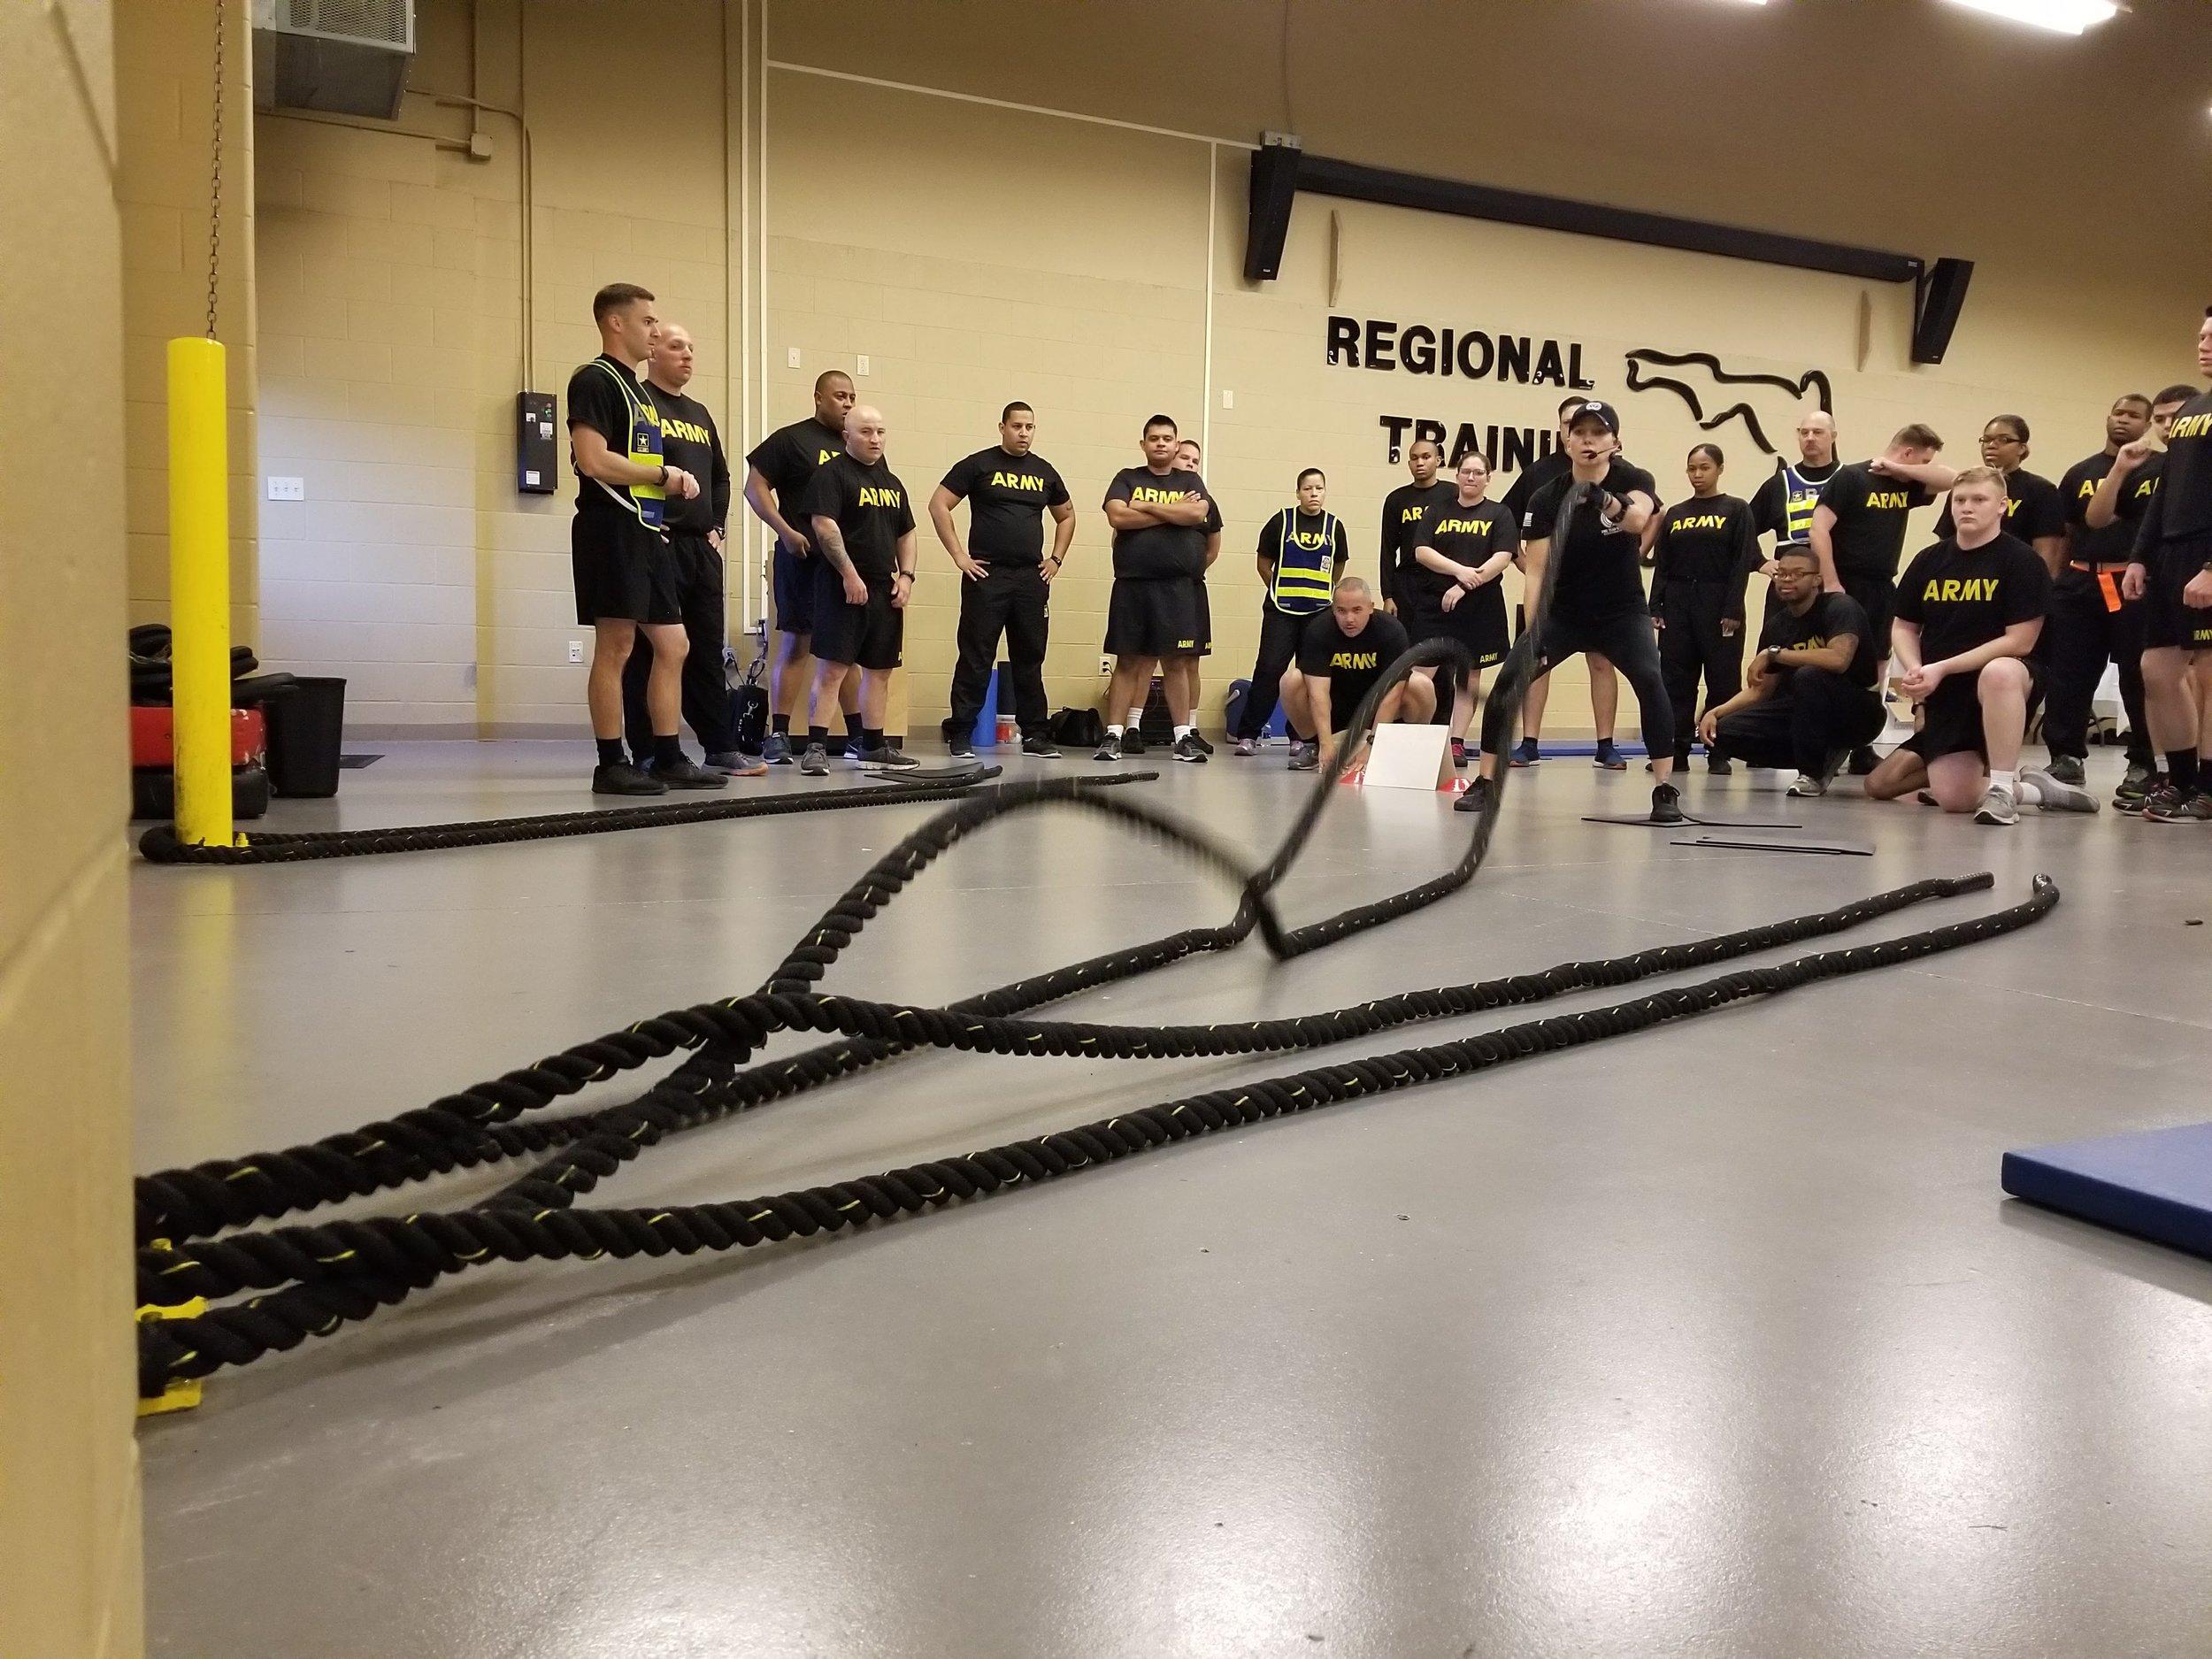 battle rope.jpg